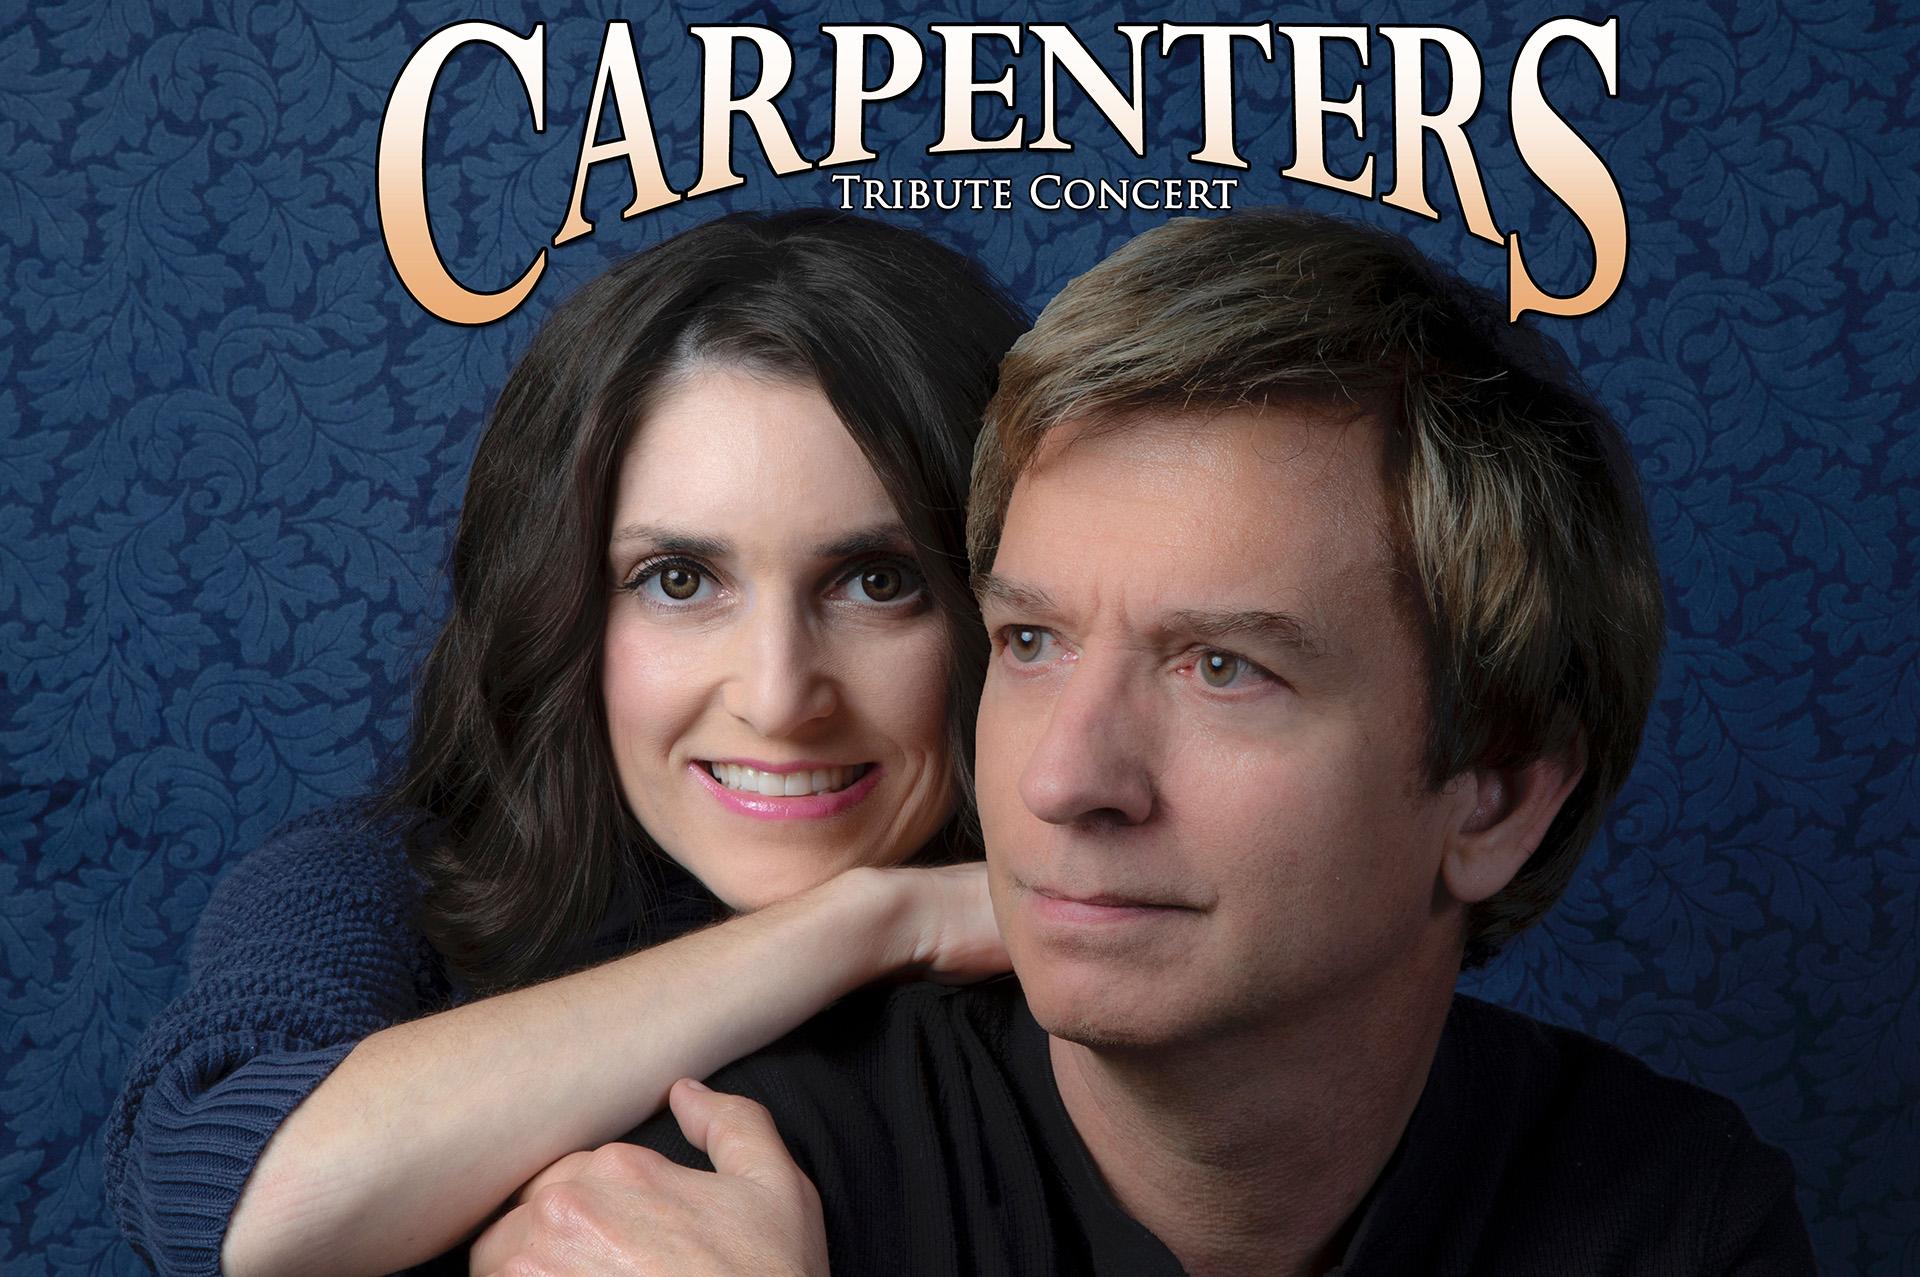 carpenters-homepage-01